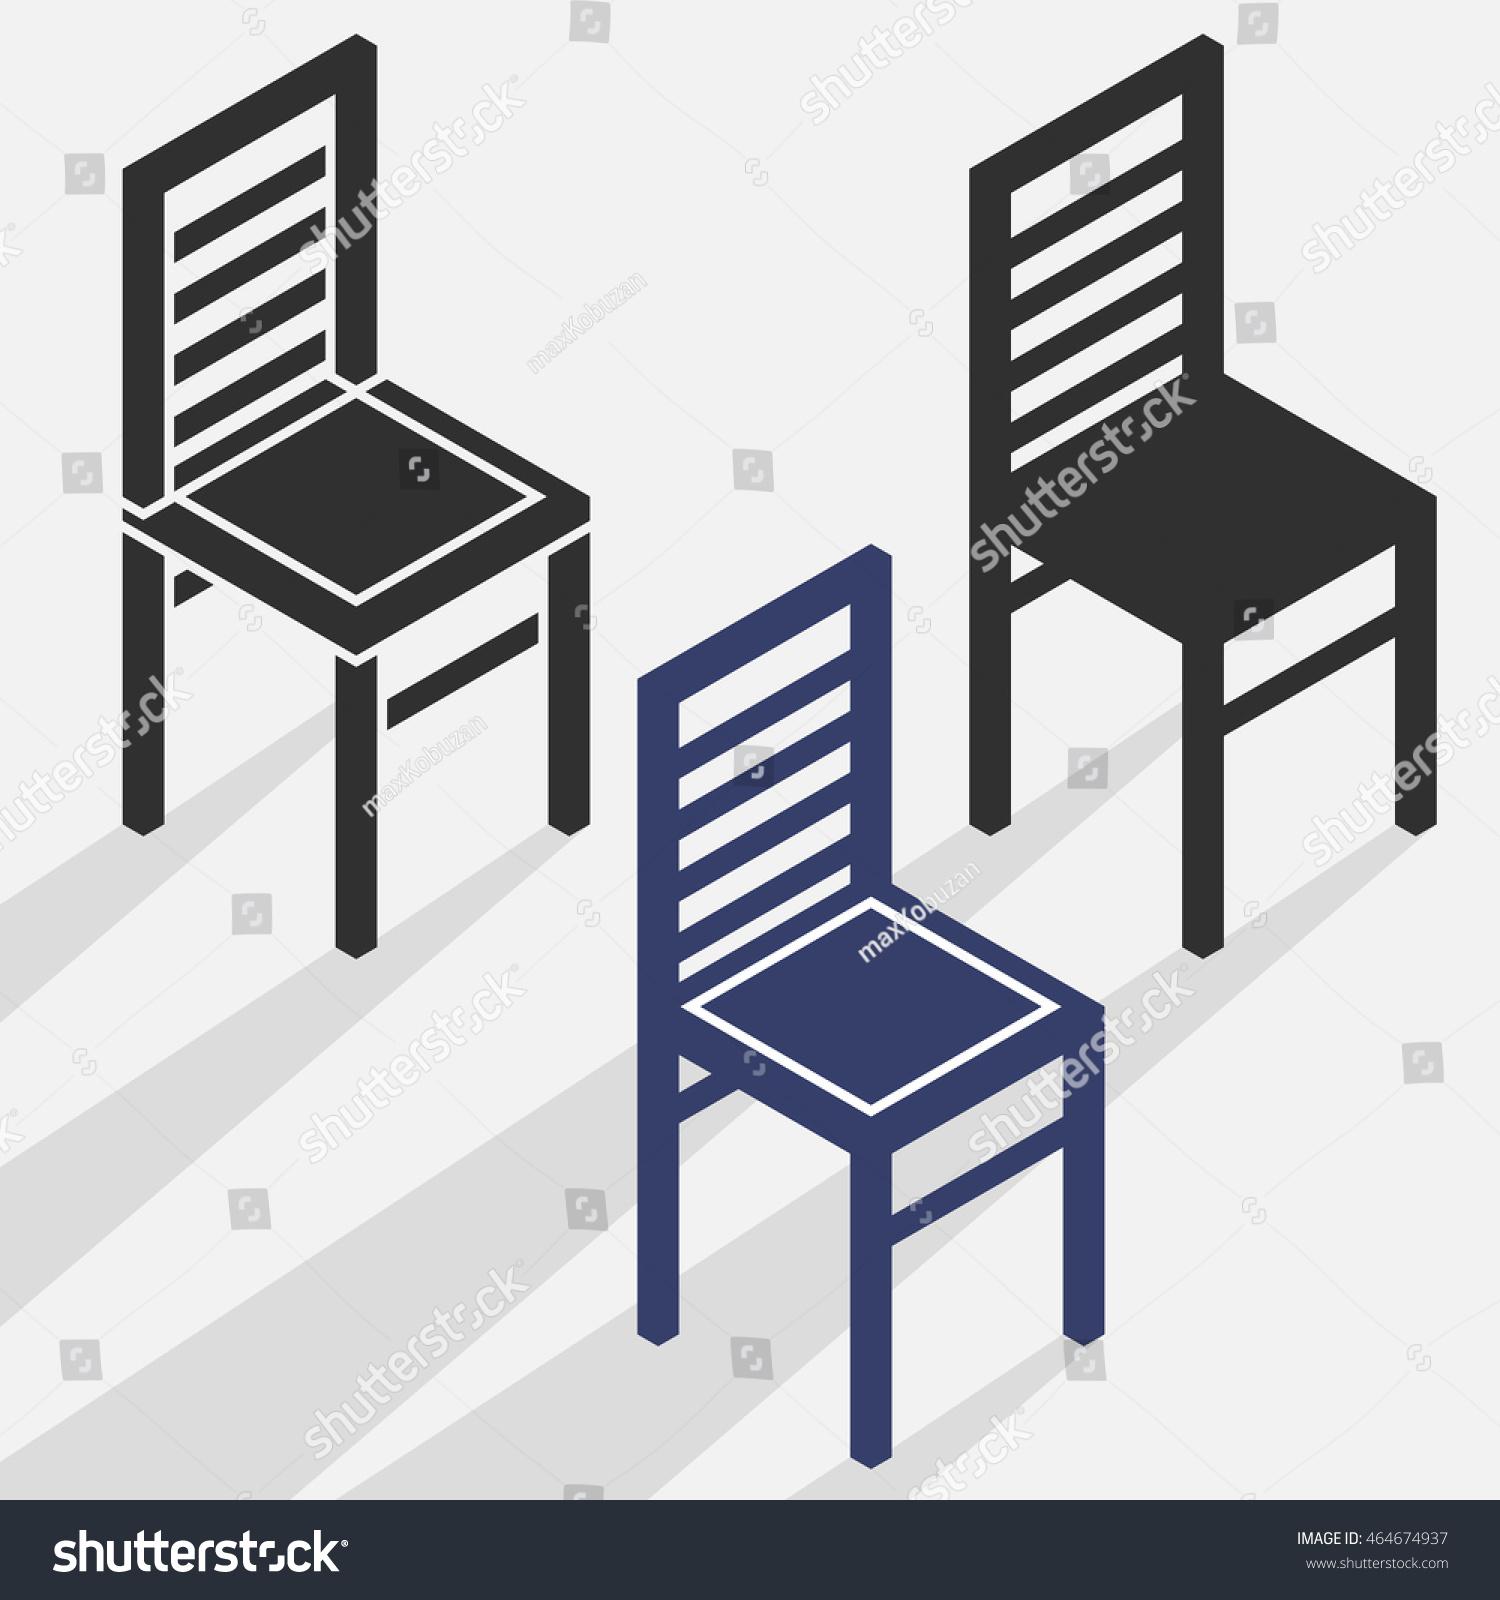 Isometric Flat Chair Sign Logo Vector Stock Vector